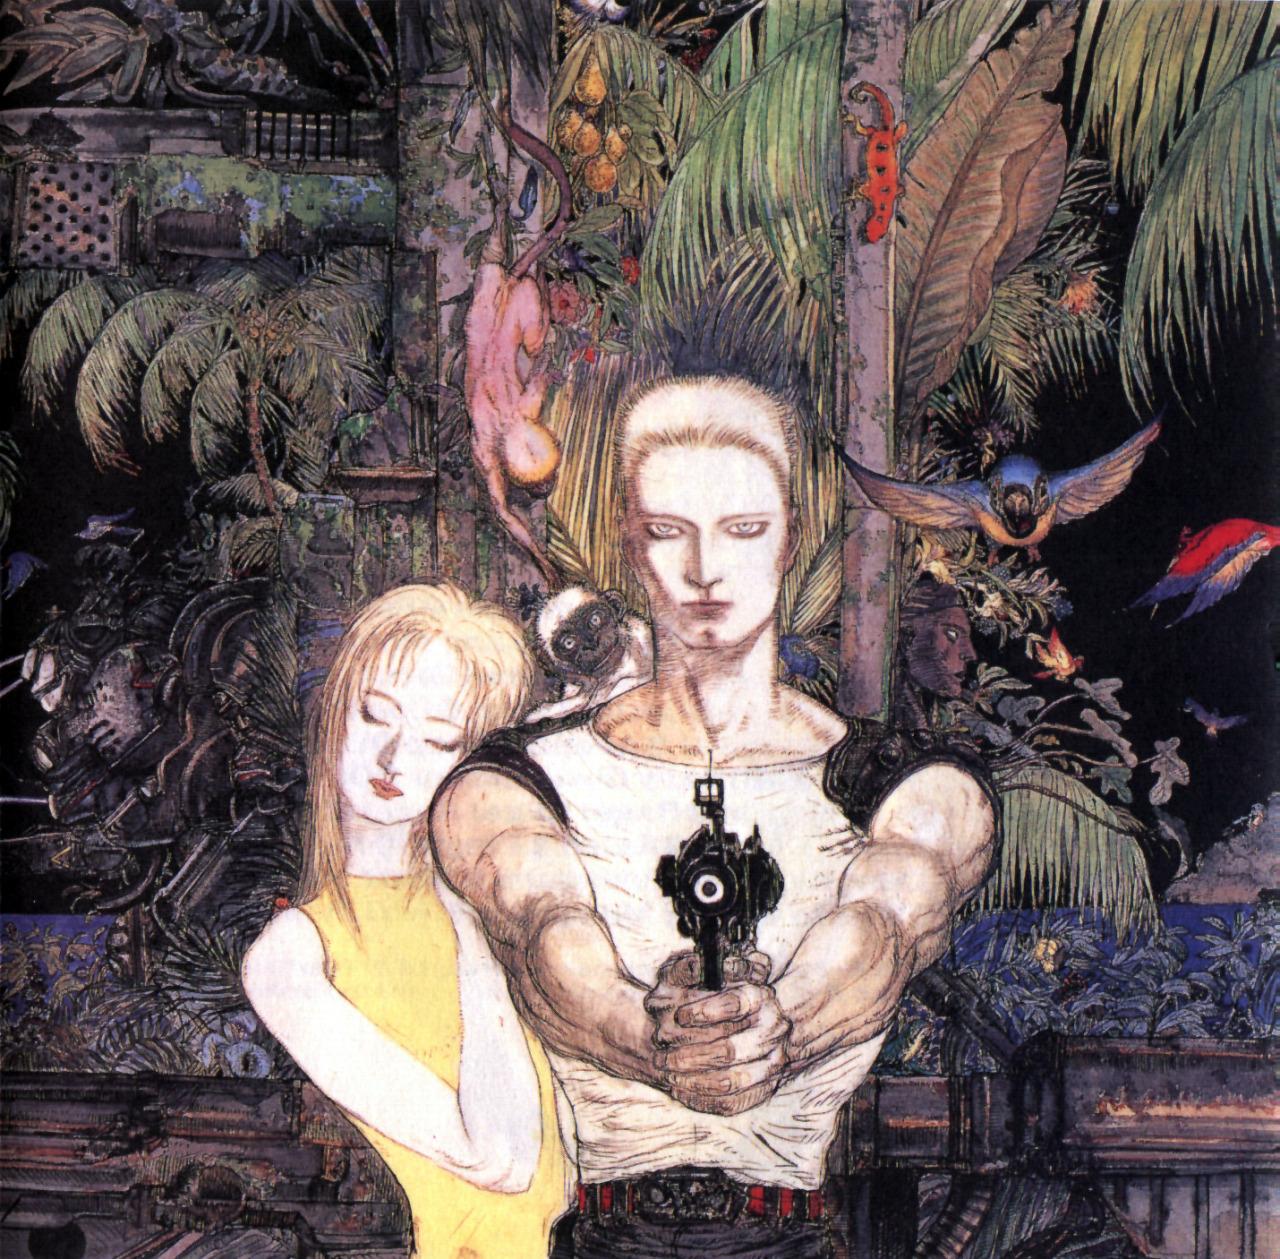 Final Fantasy XV (PS4/X1) - Page 5 Tumblr_n94xitsPye1sctm9xo1_1280